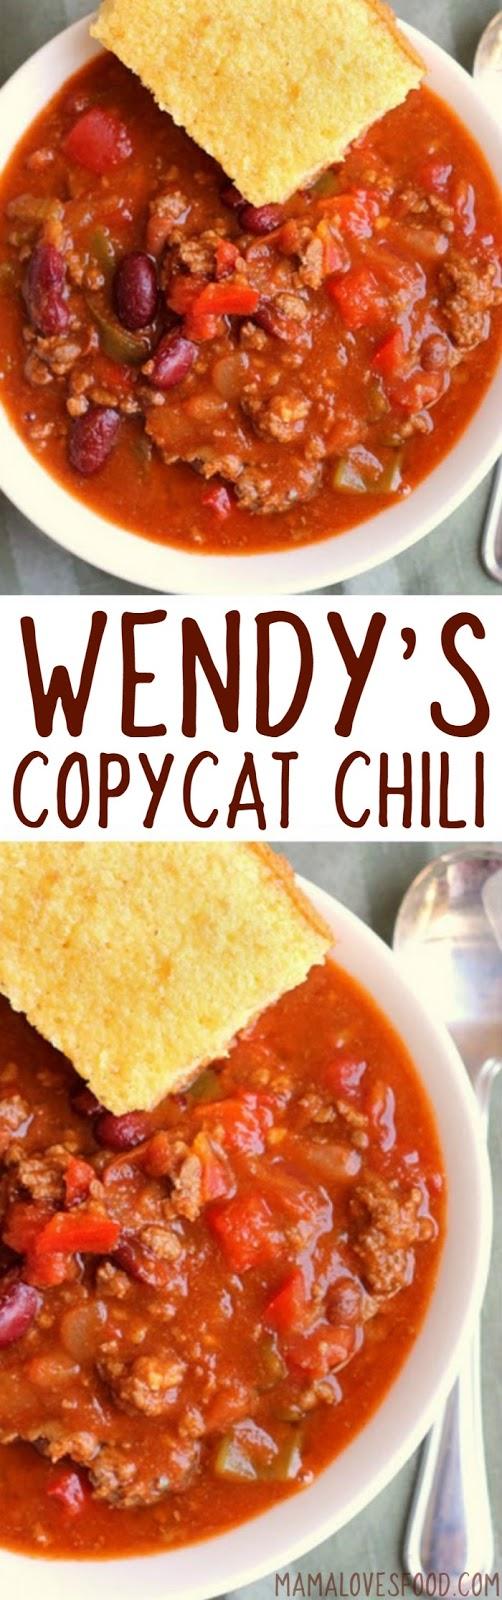 Easy Wendy's Chili Recipe